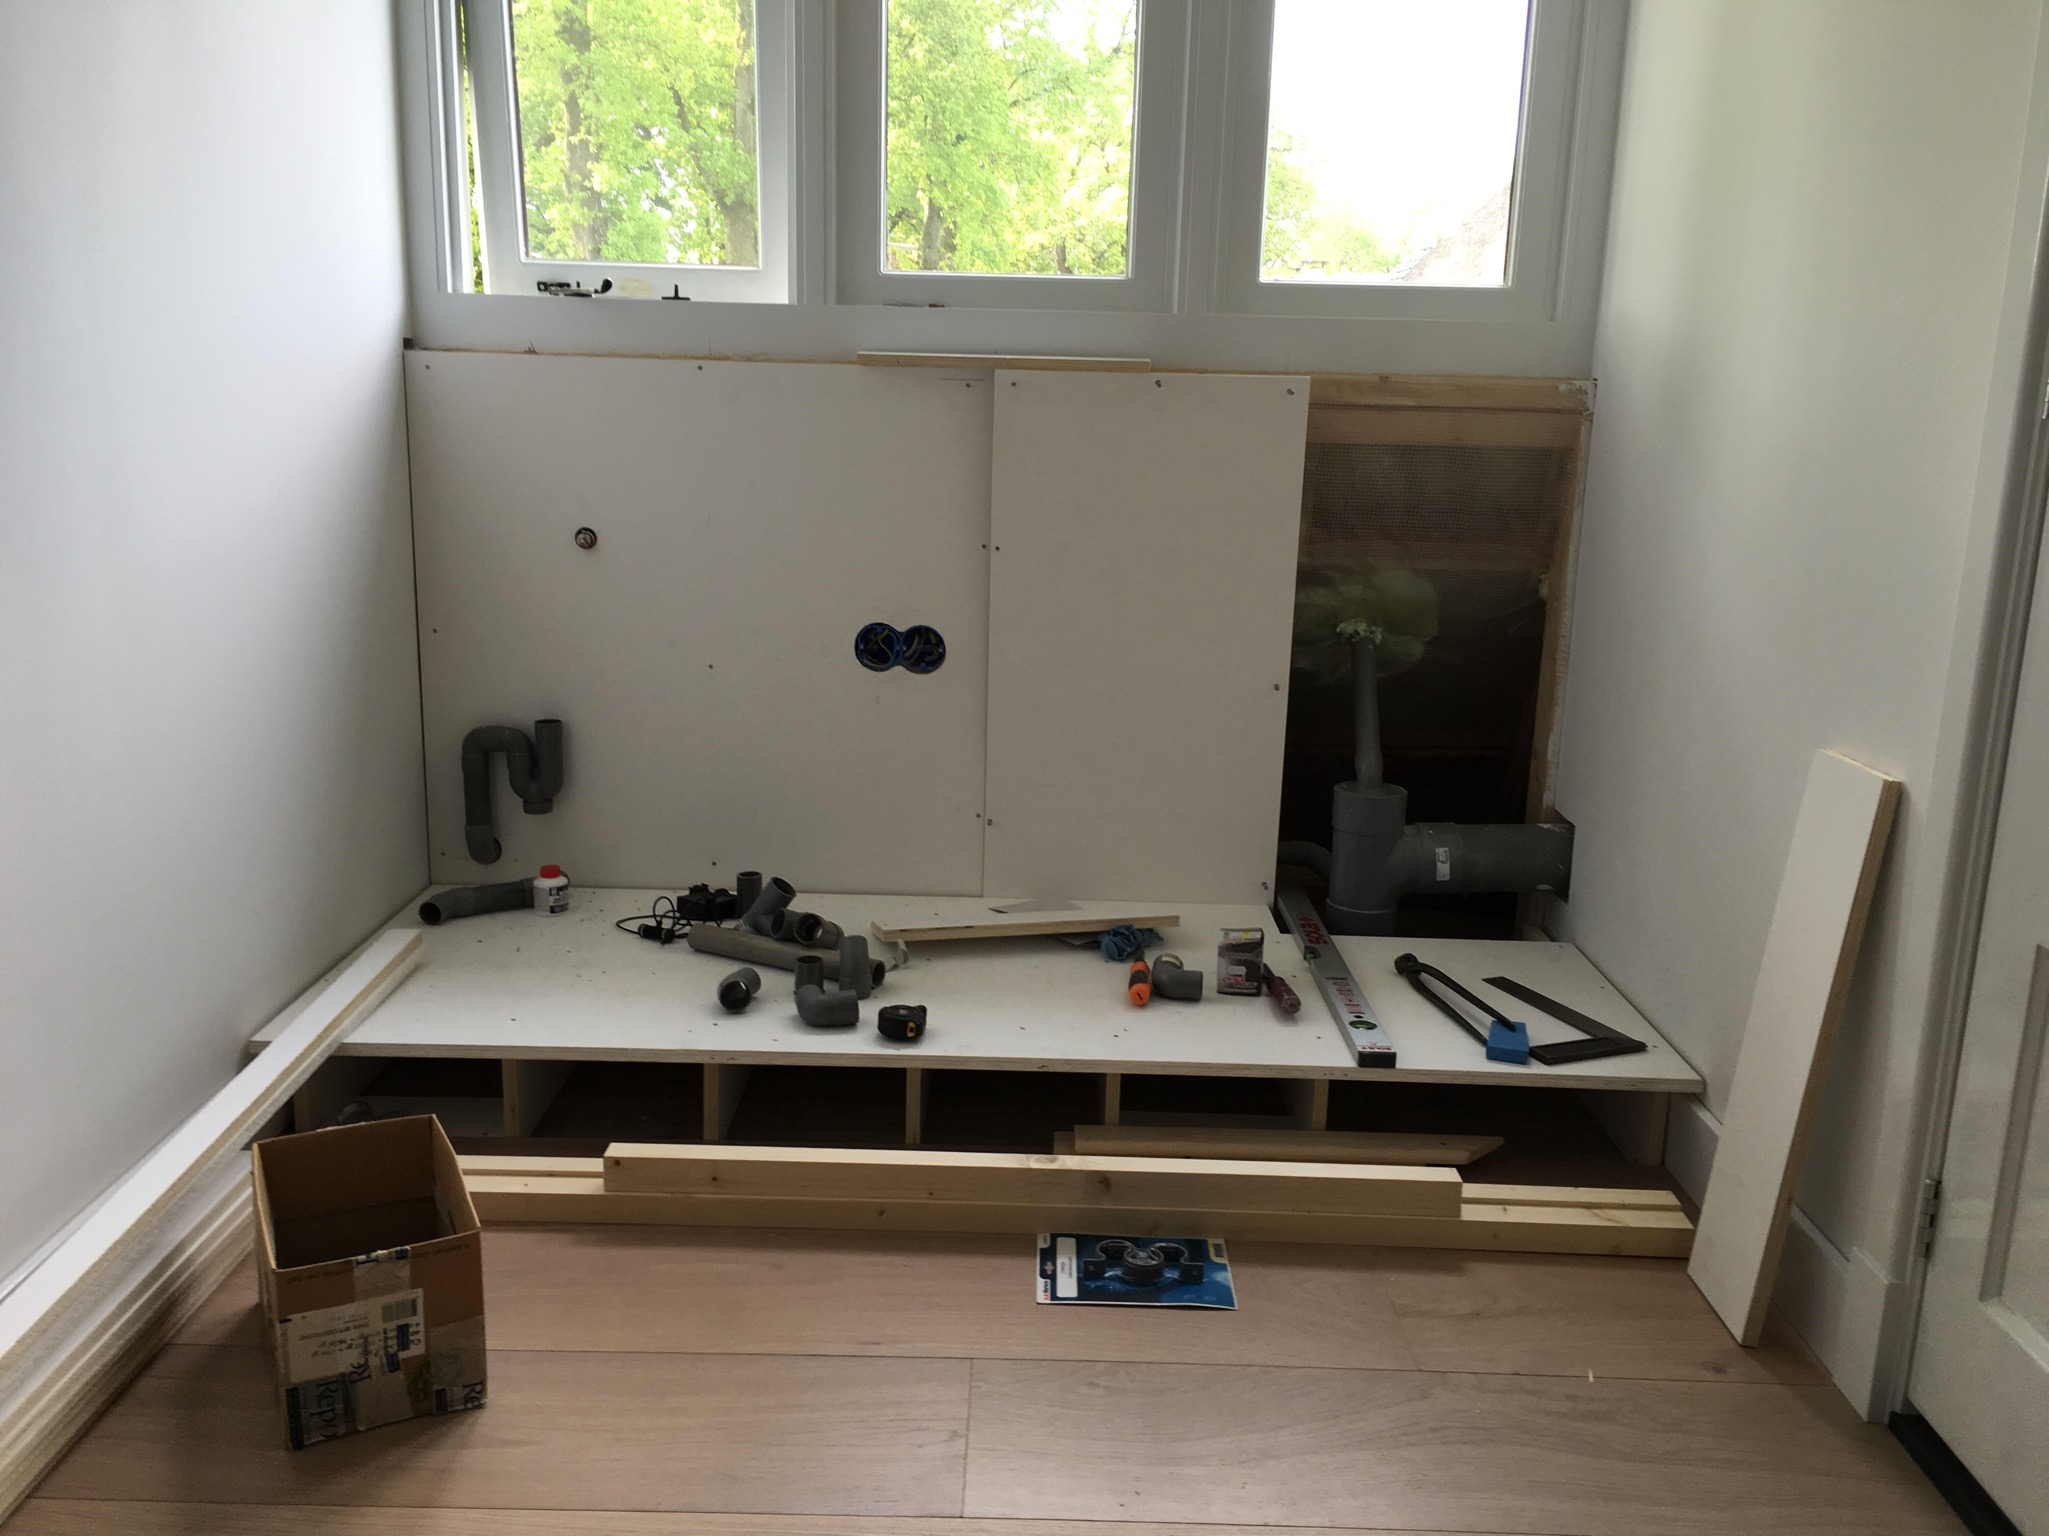 Diy: wasmachine ombouw   inspiraties   showhome.nl